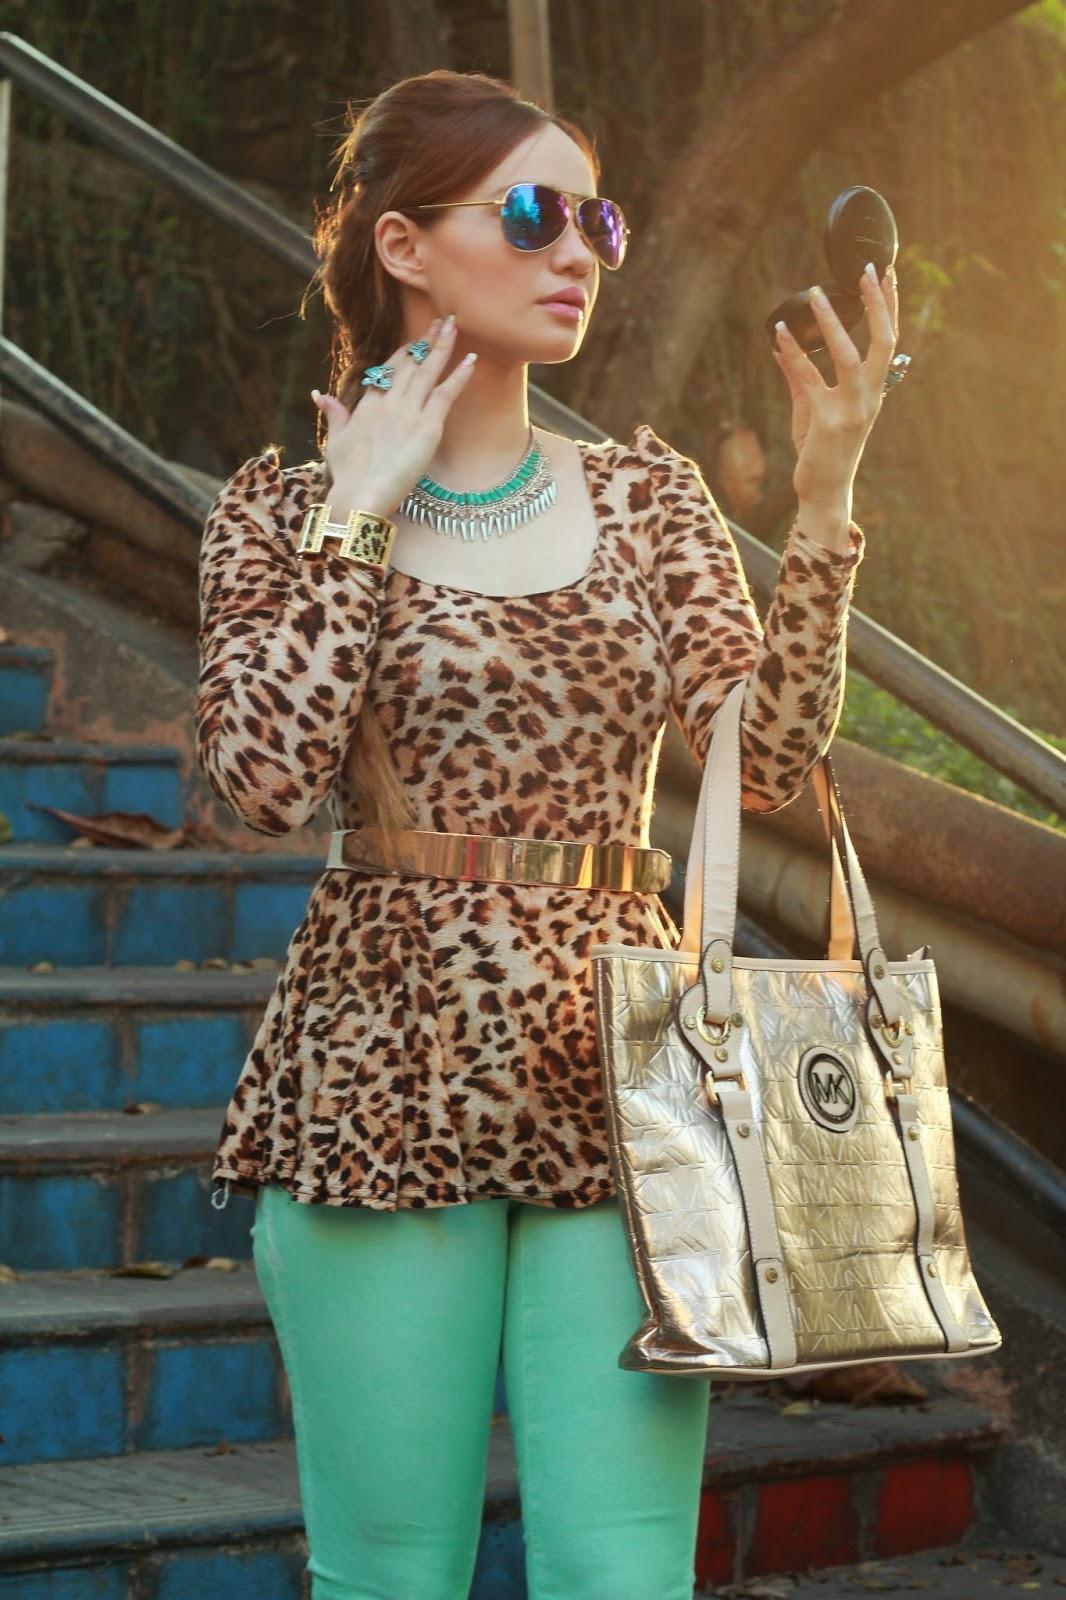 A feisty leopard slut amp her man 9